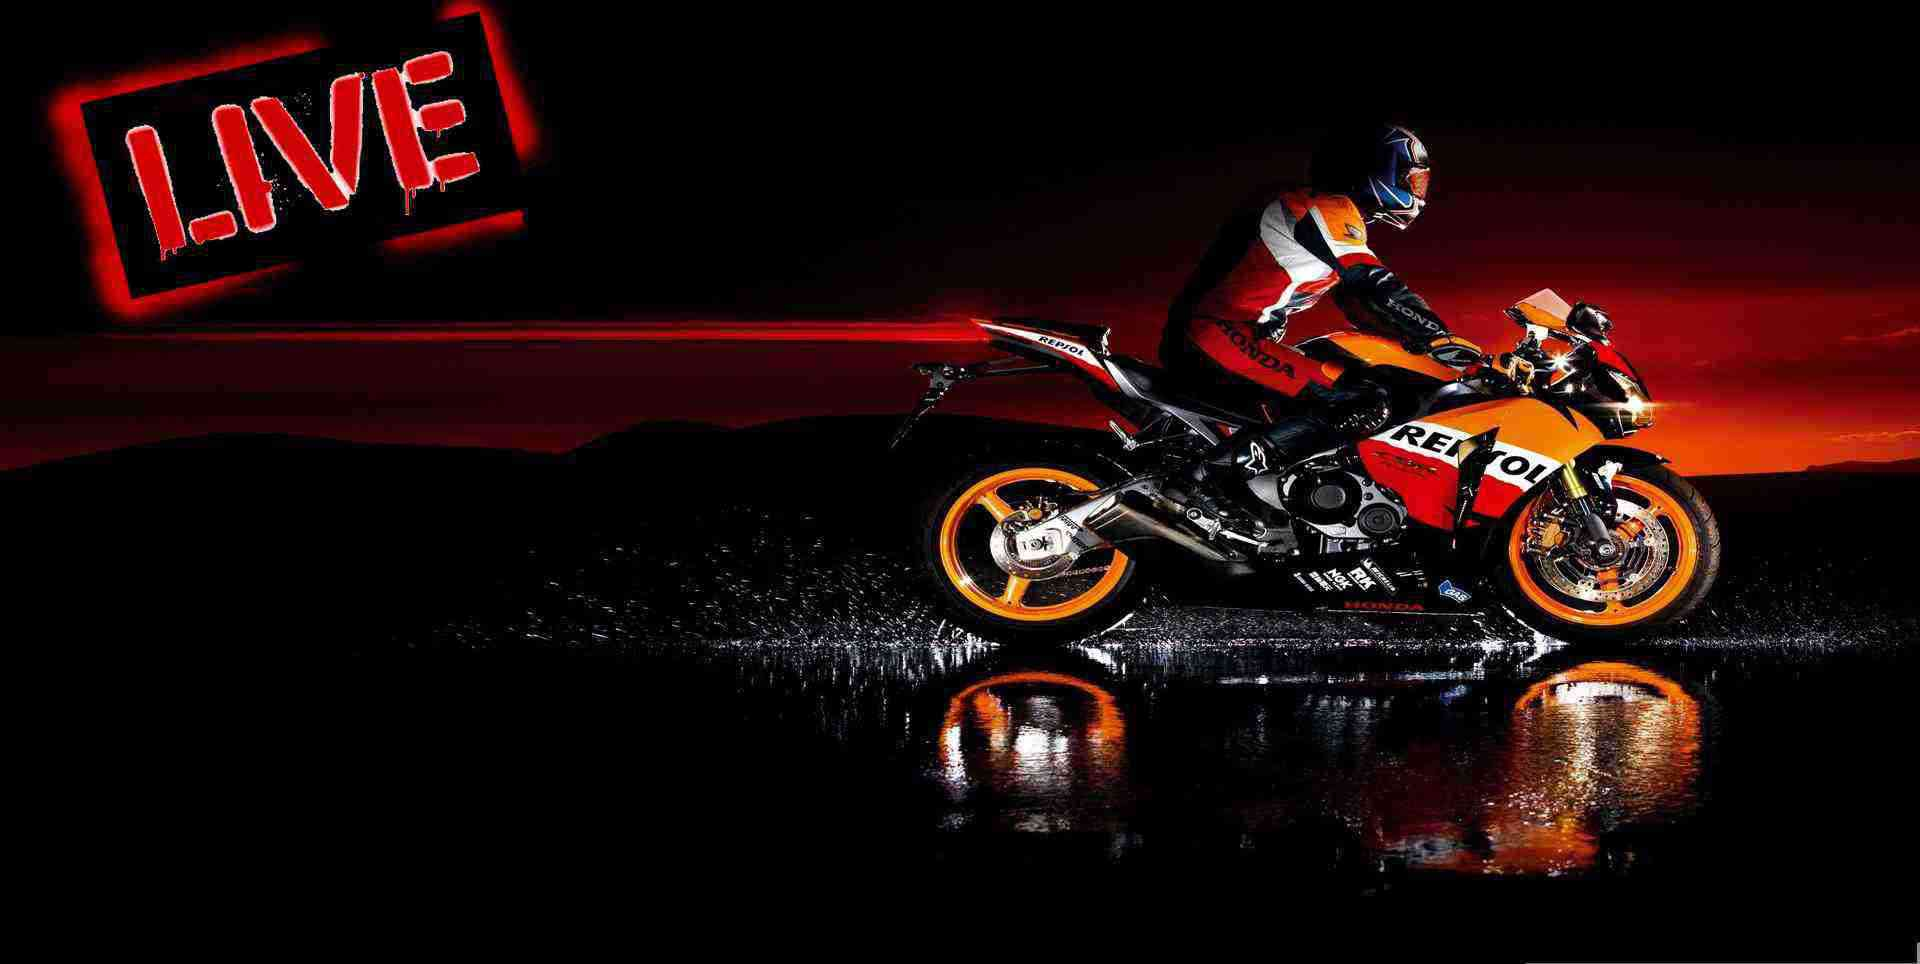 motogp-online:-live-hjc-helmets-grand-prix-czech-republic-2016-stream